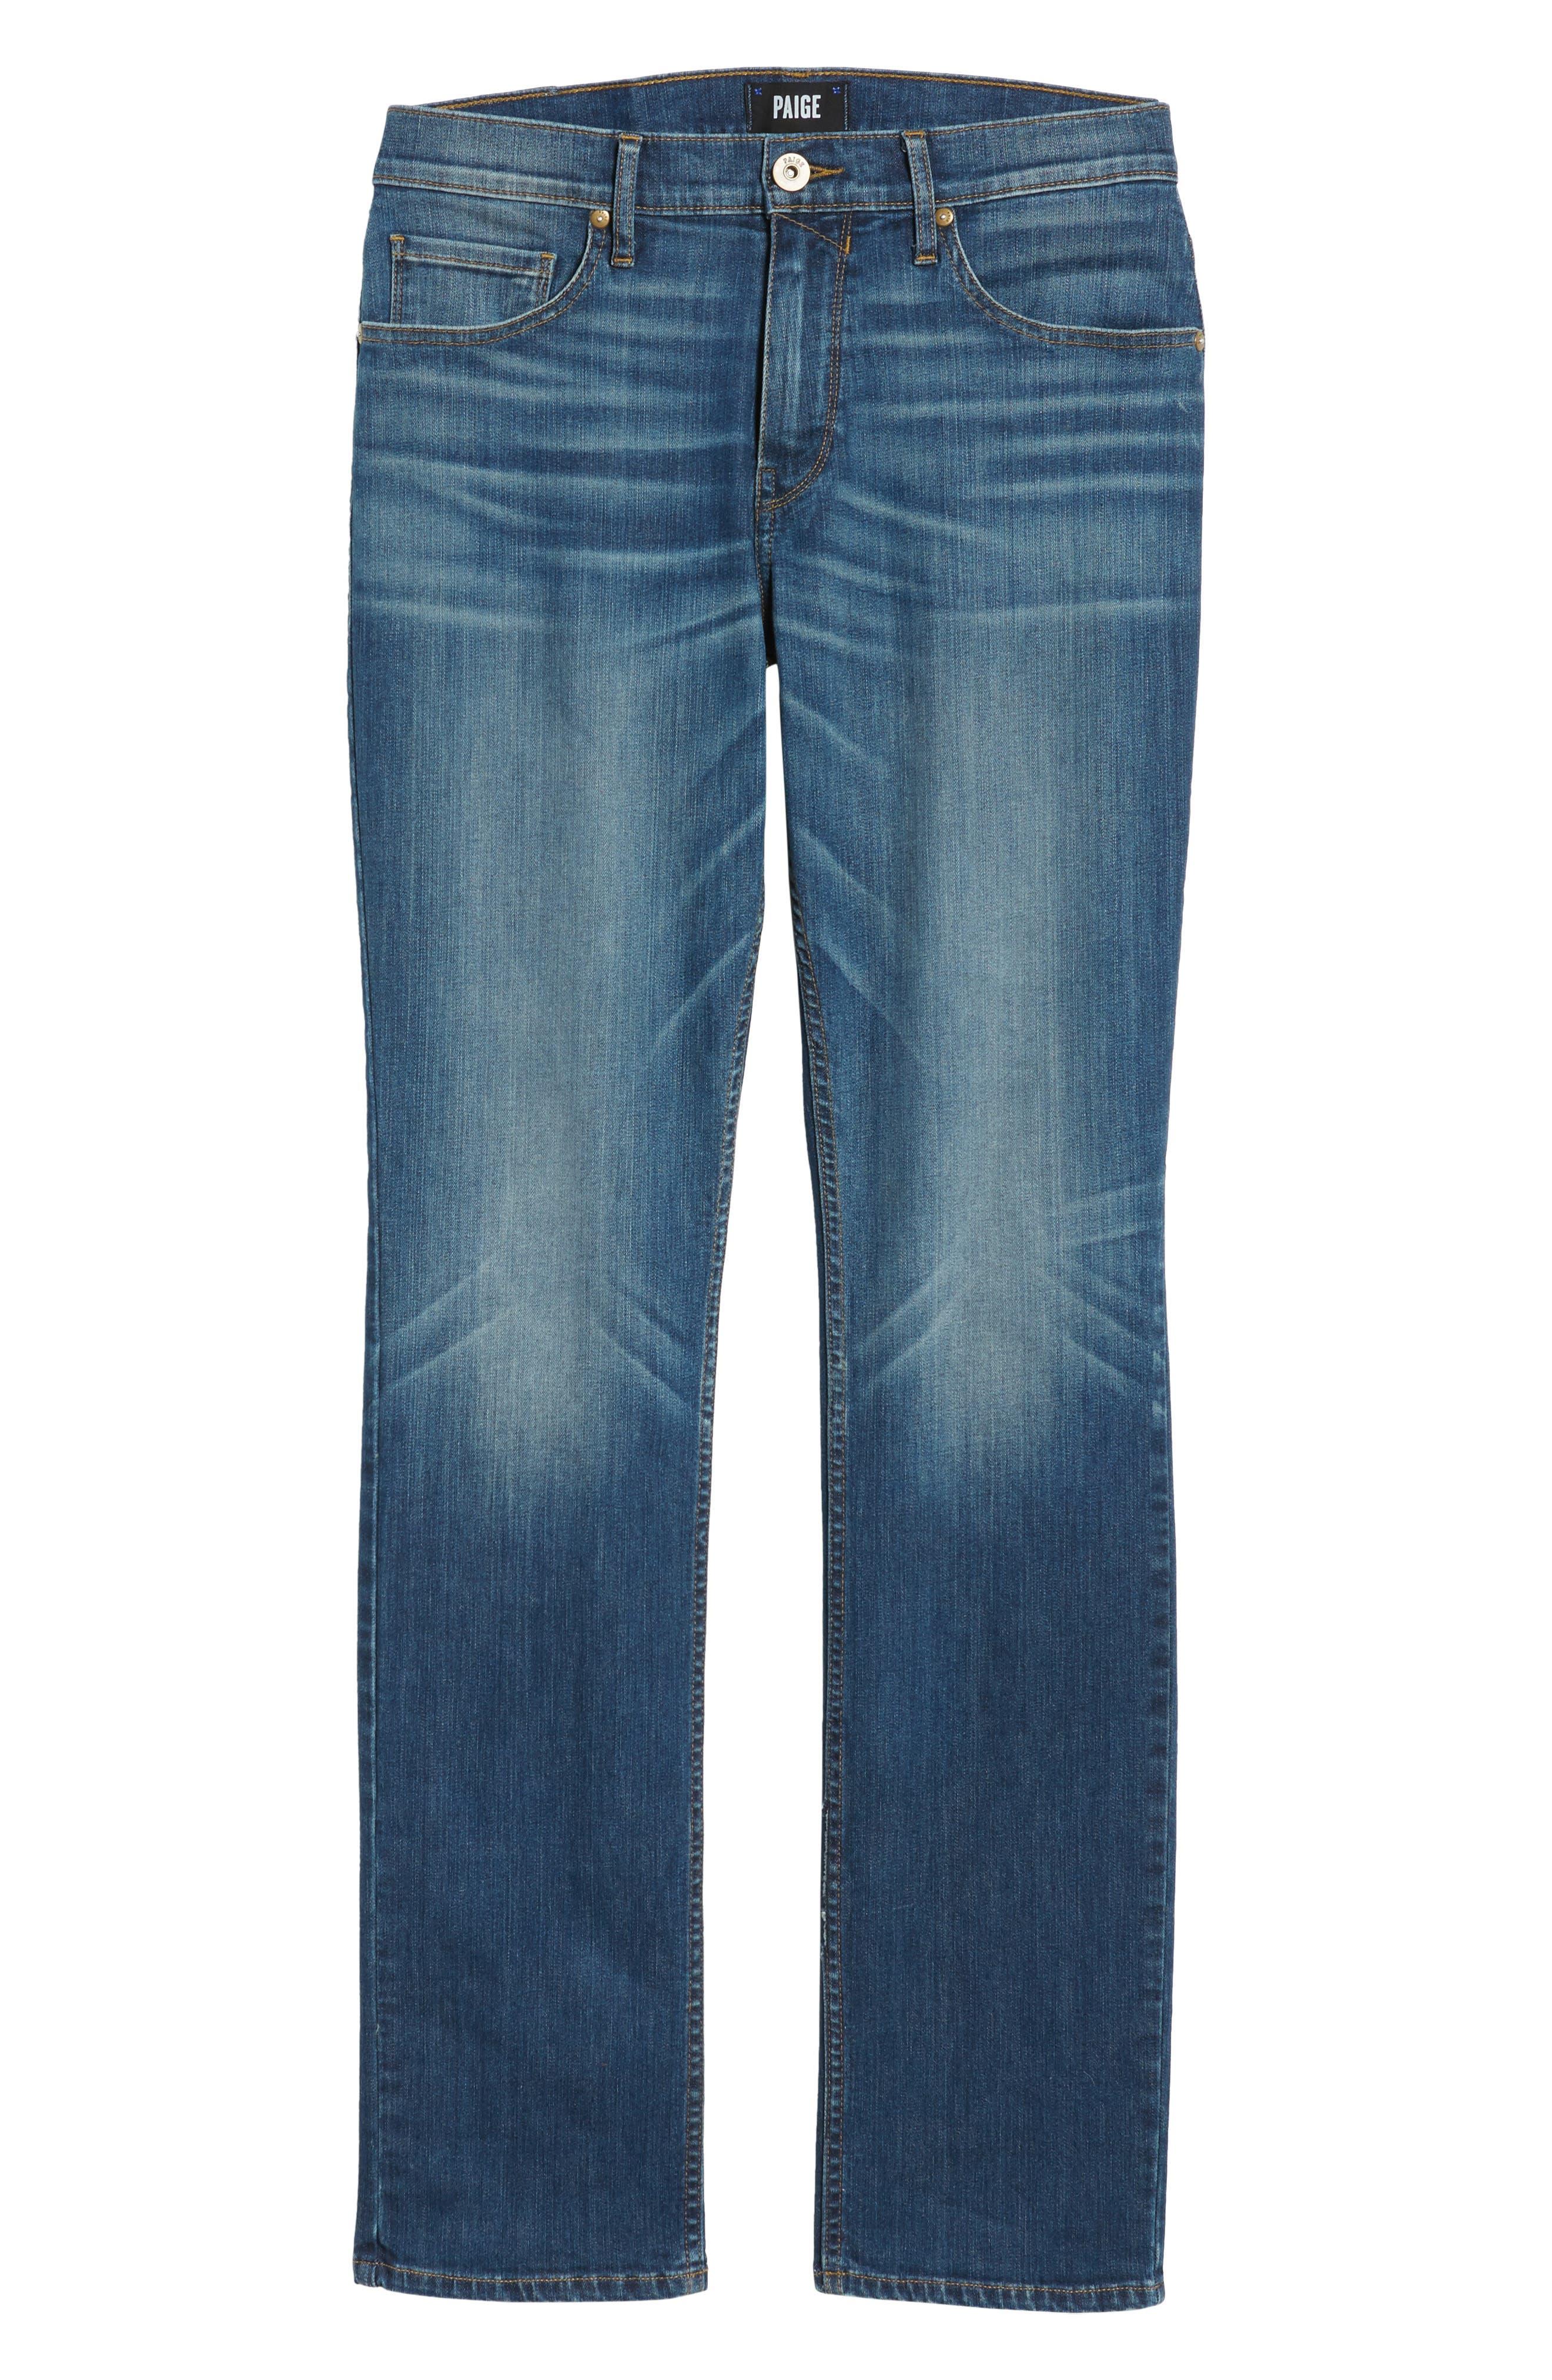 Federal Slim Straight Leg Jeans,                             Alternate thumbnail 6, color,                             Harlan